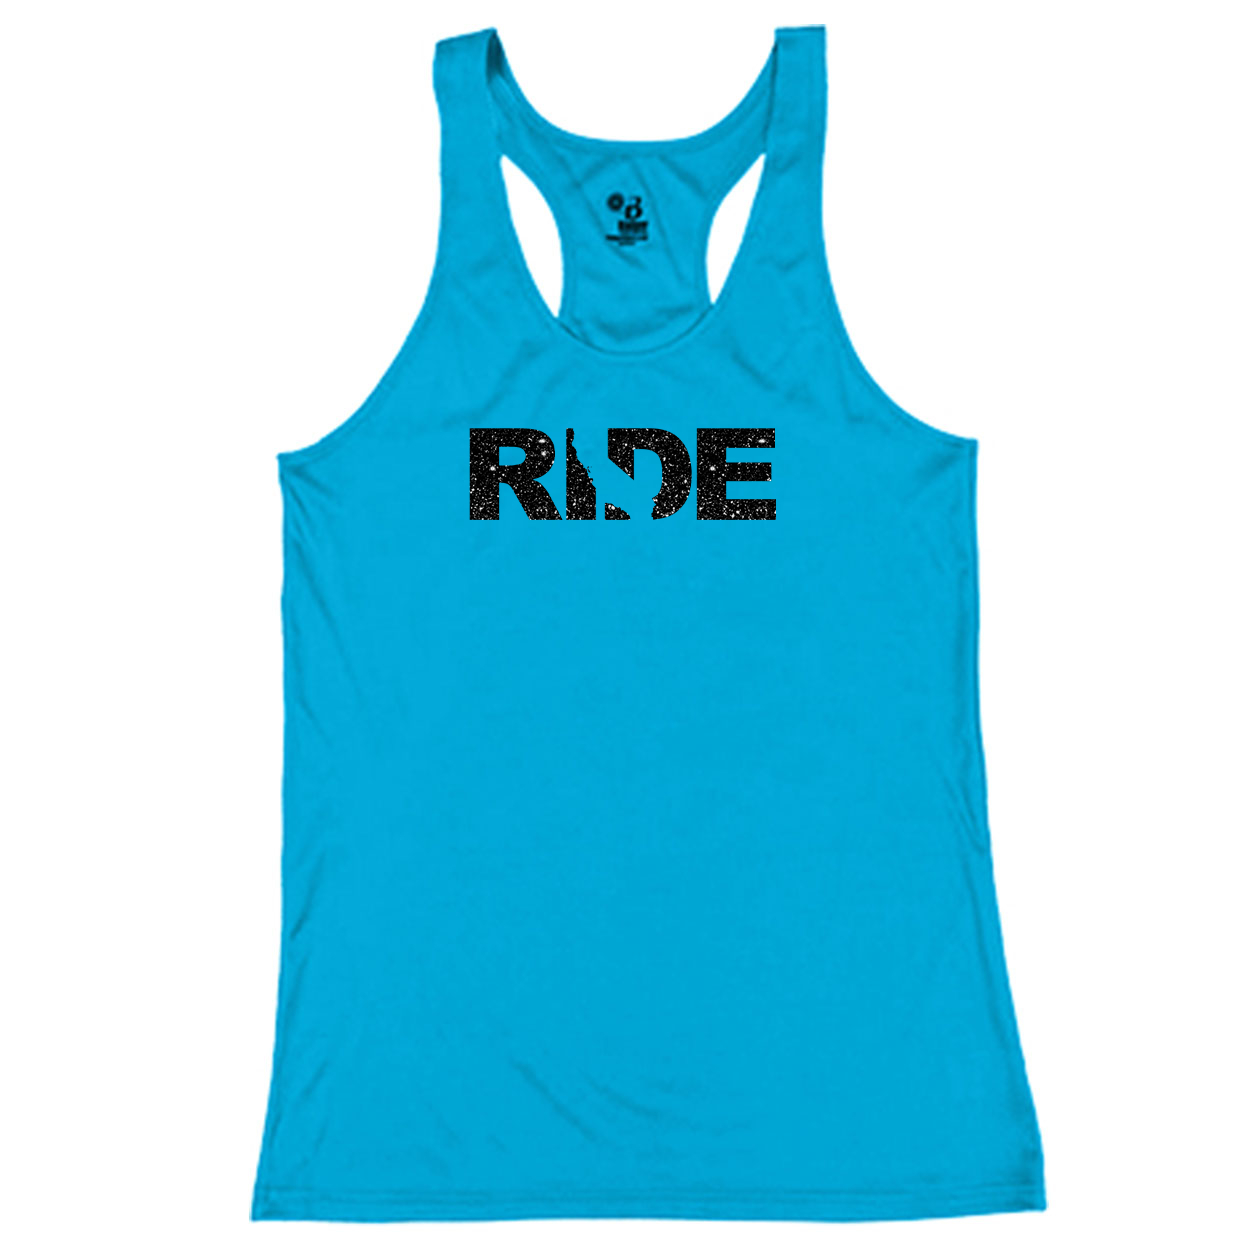 Ride California Classic Youth Girls Performance Racerback Tank Top Electric Blue (Glitter Black Logo)